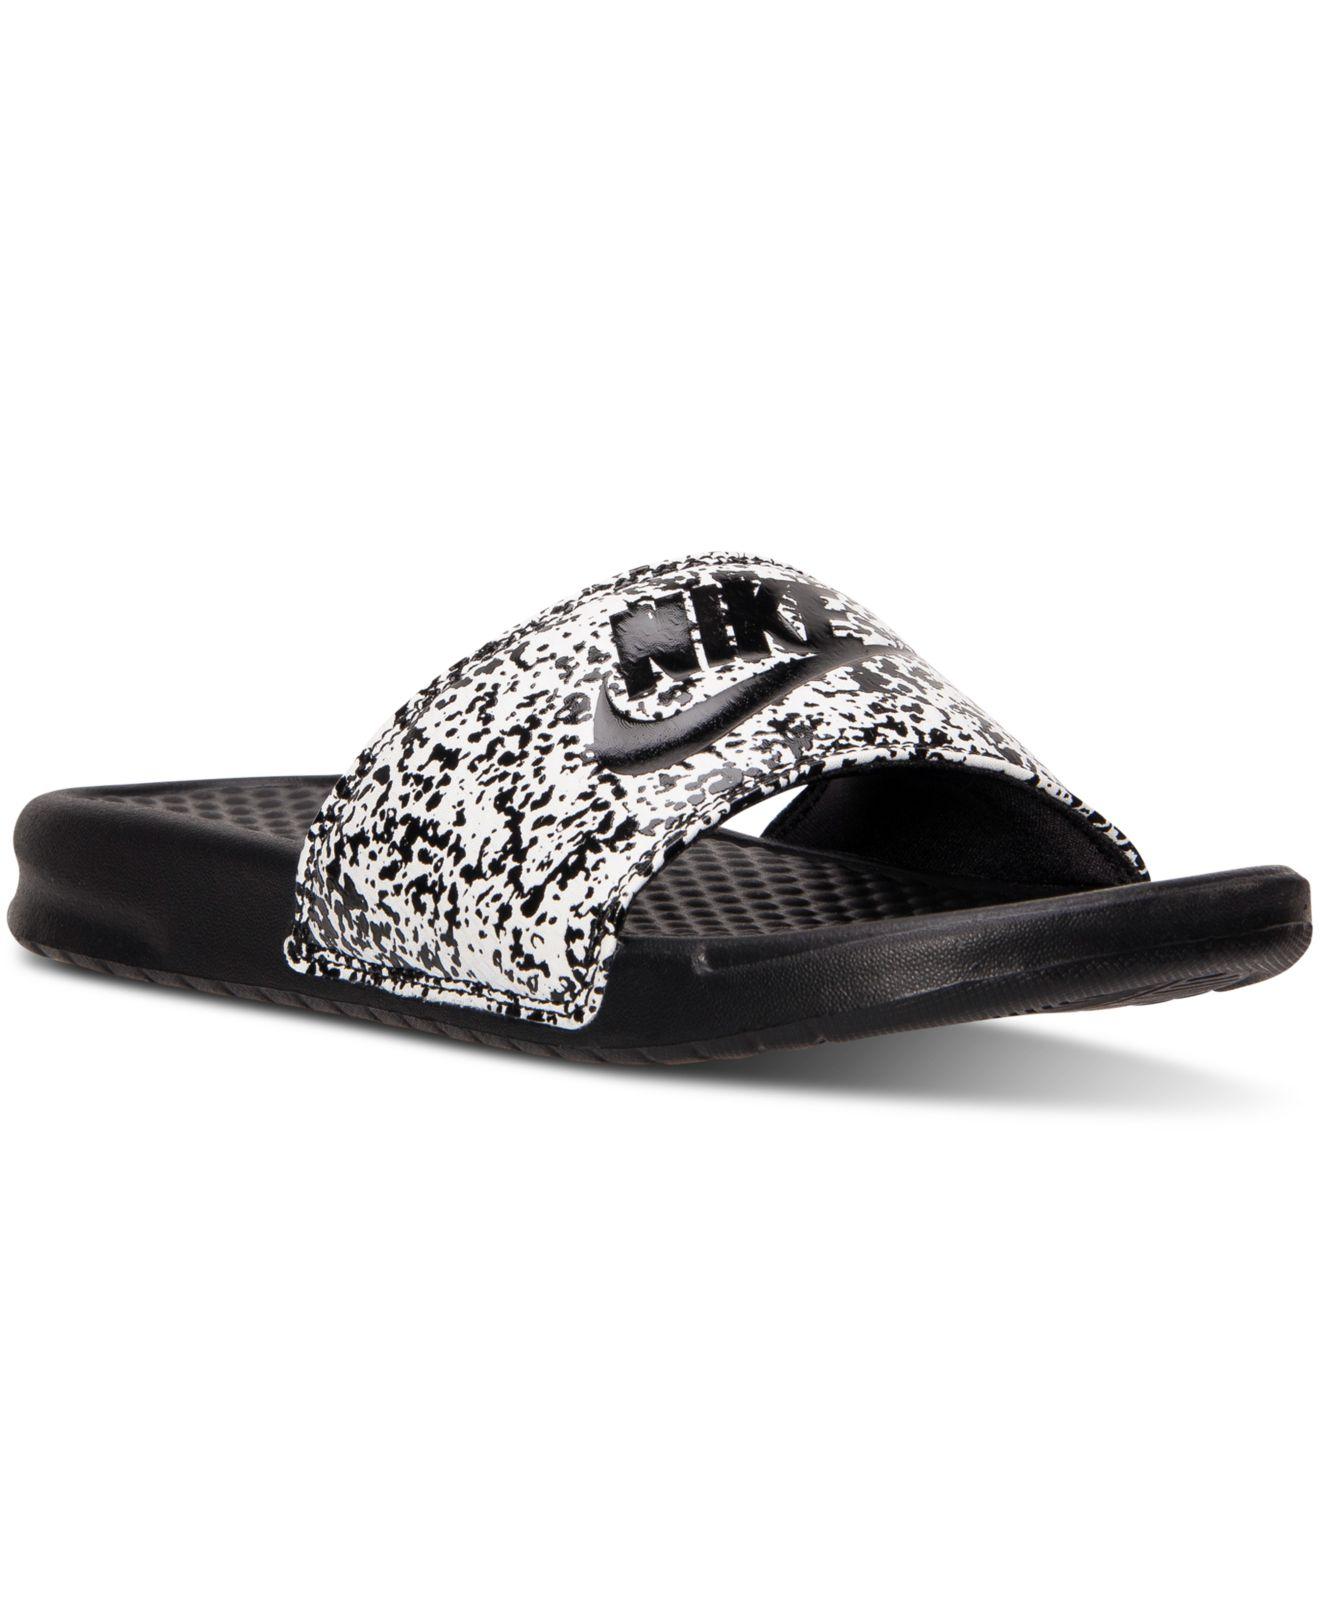 Nike Men S Benassi Jdi Print Slide Sandals From Finish